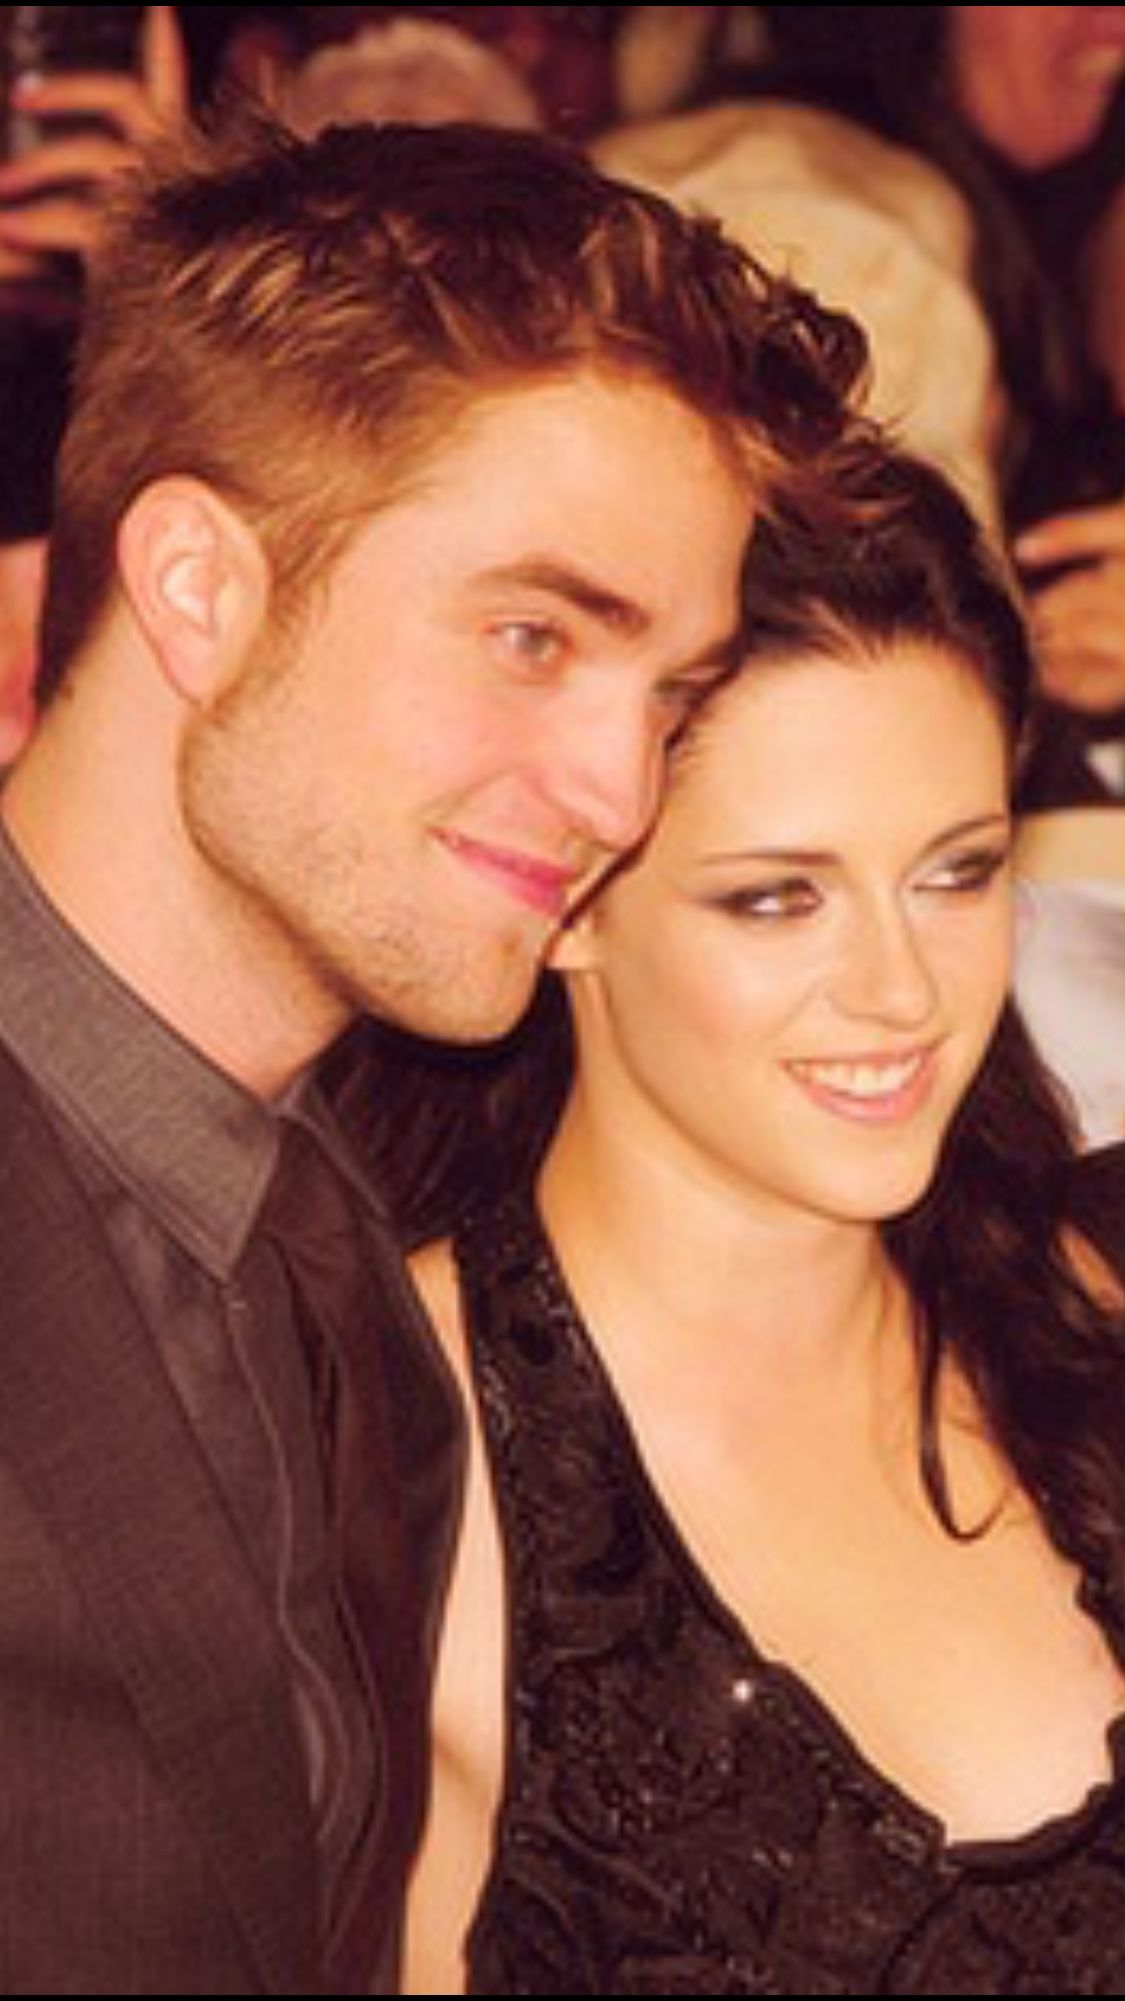 R K At Twilight Premier London Robert Pattinson Robert Pattinson And Kristen Kristen